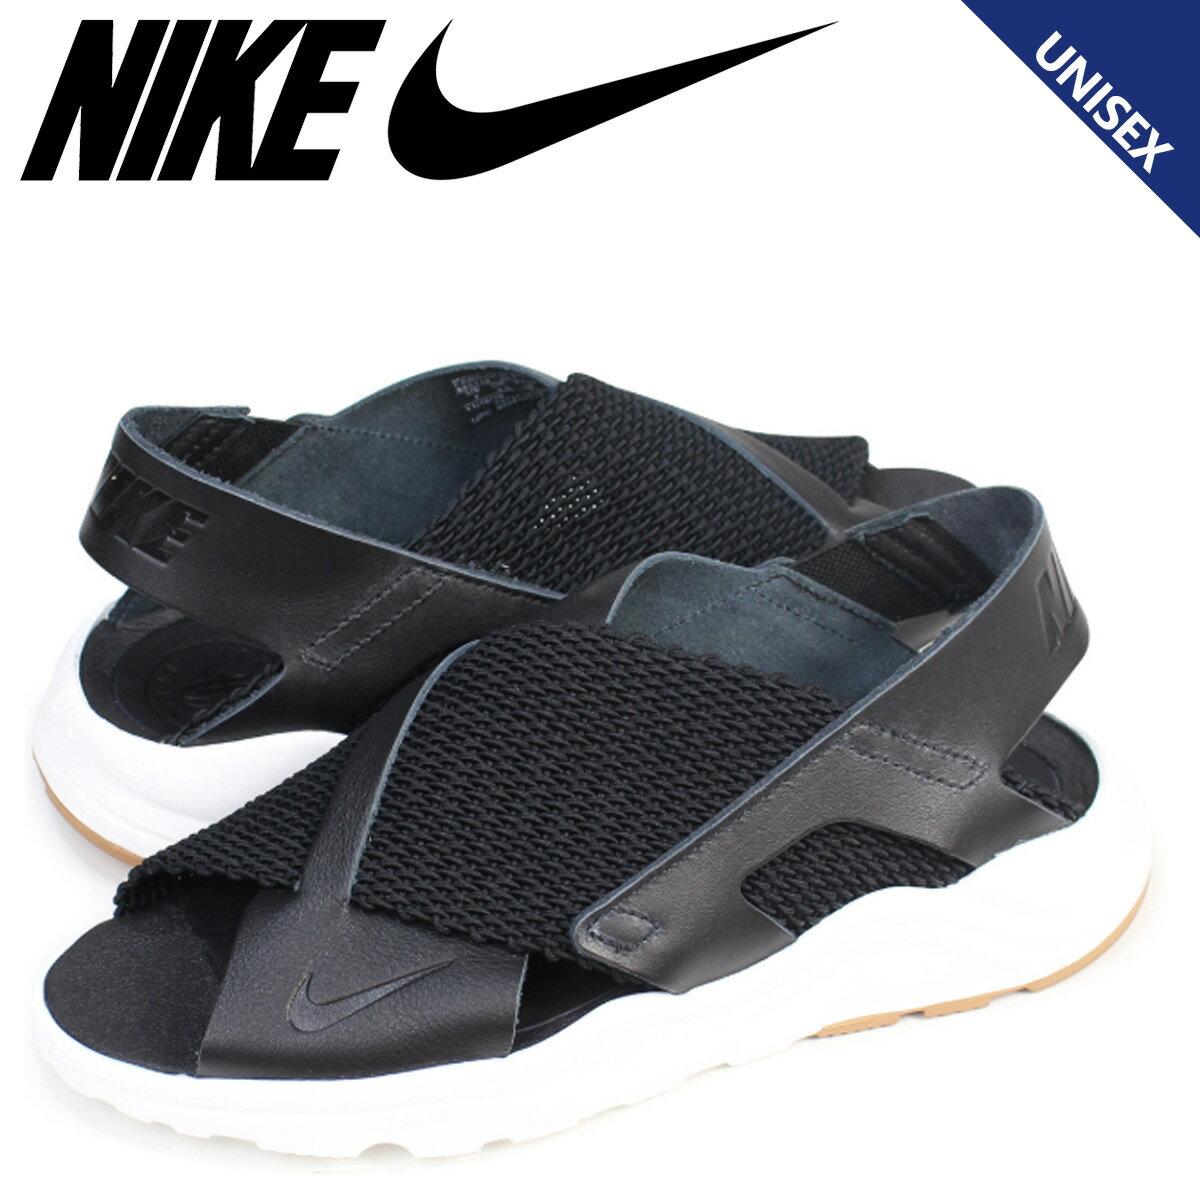 Nike Thrasher Shoes